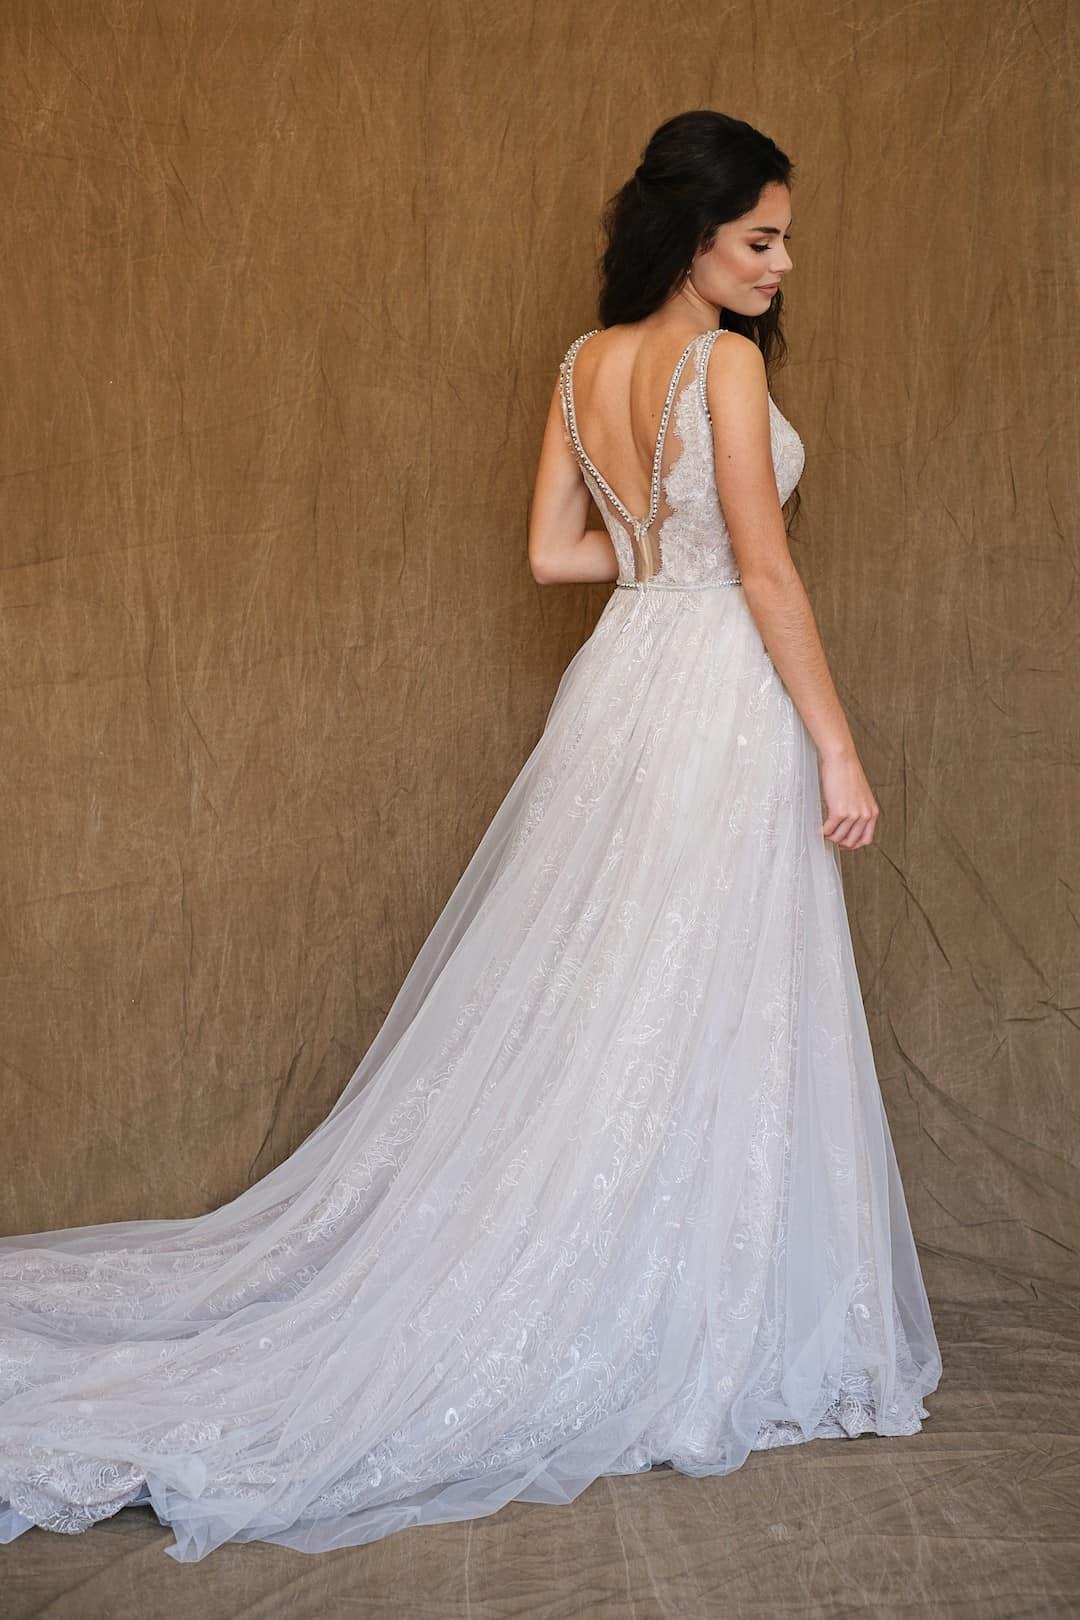 Haute Couture Eskuvoi Ruhak - Galia Lahav - Gala 711 - back